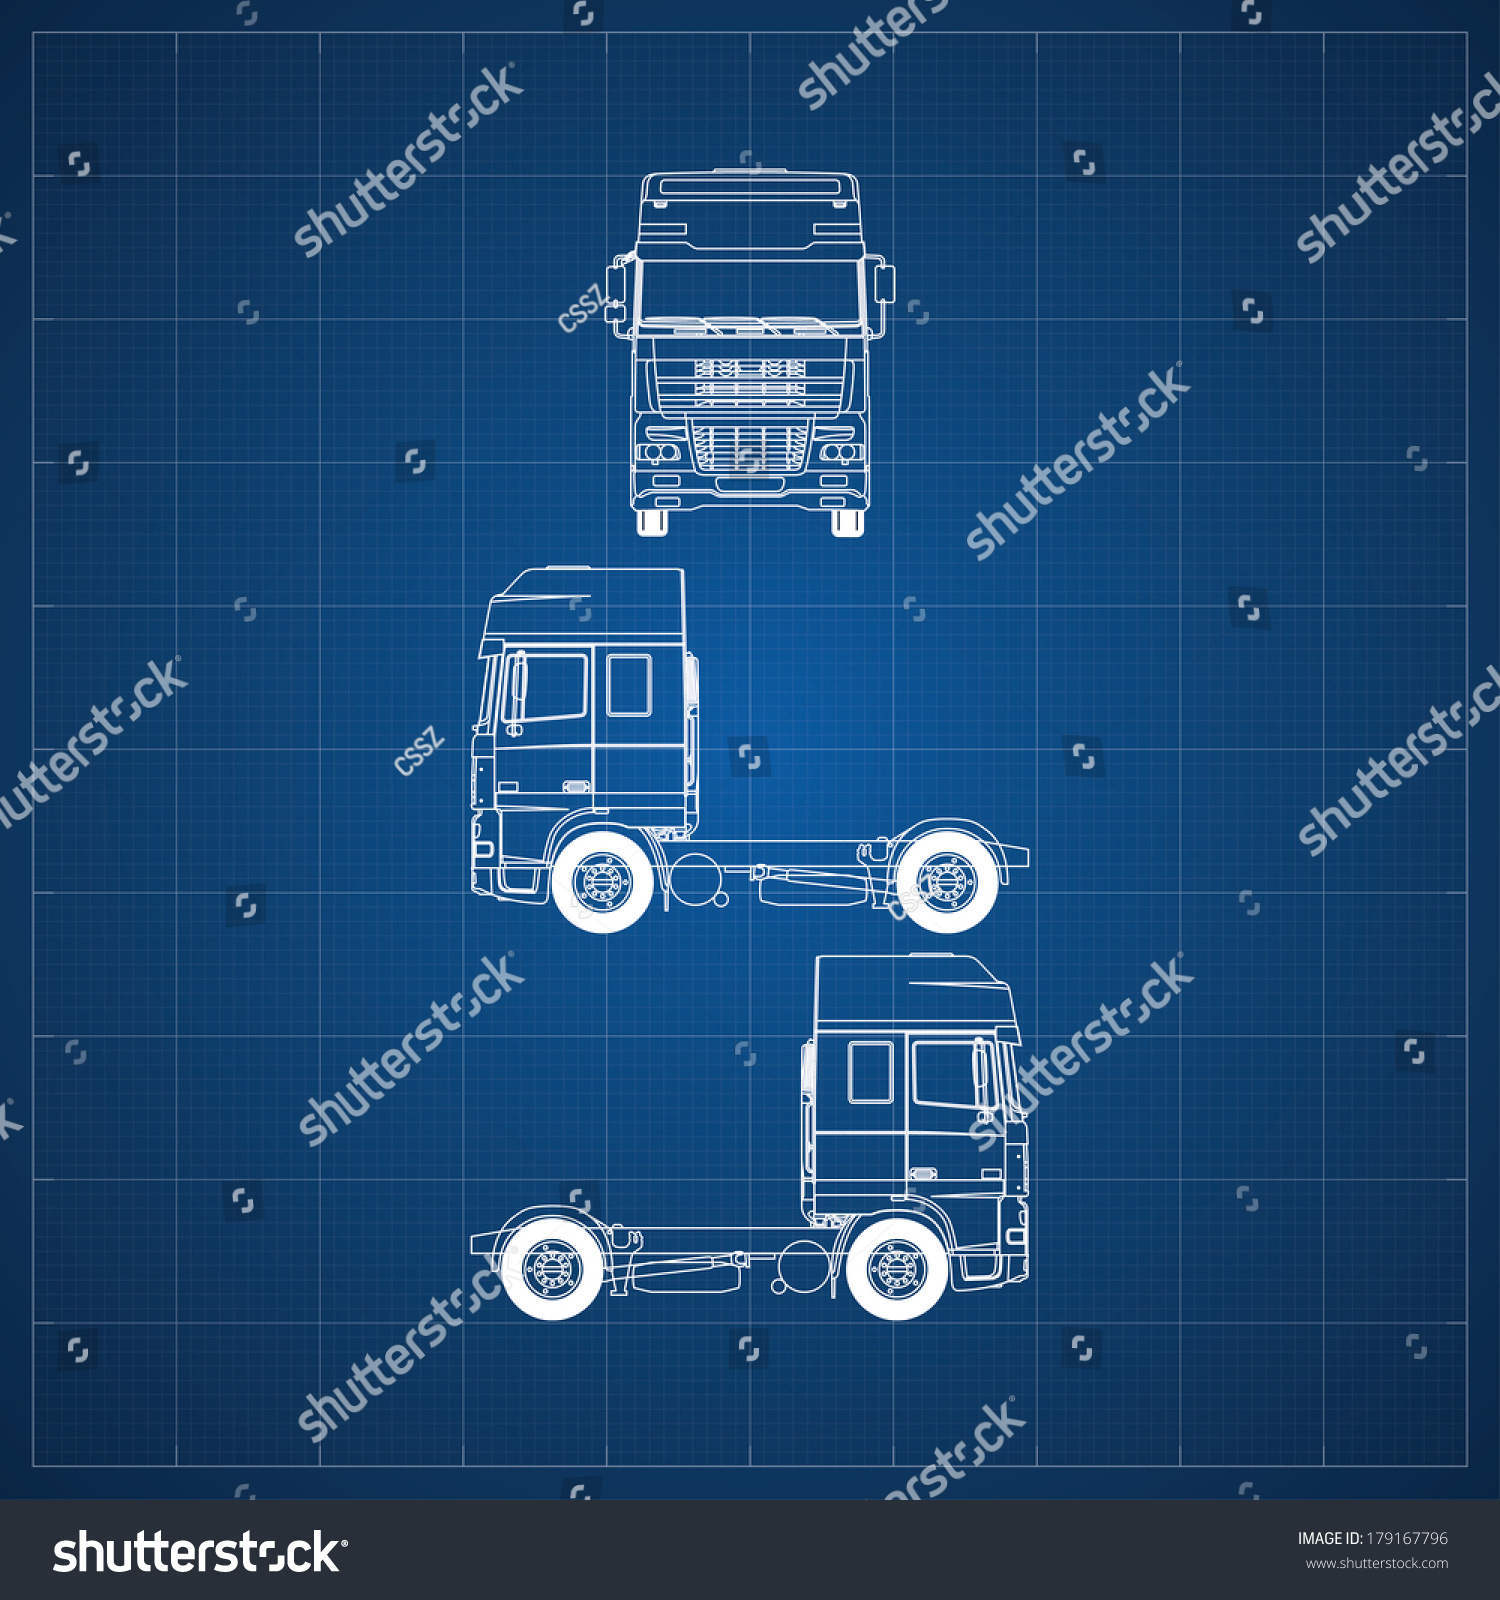 Blueprint commercial vehicle european truck head stock vector blueprint of commercial vehicle european truck head 3 views malvernweather Images